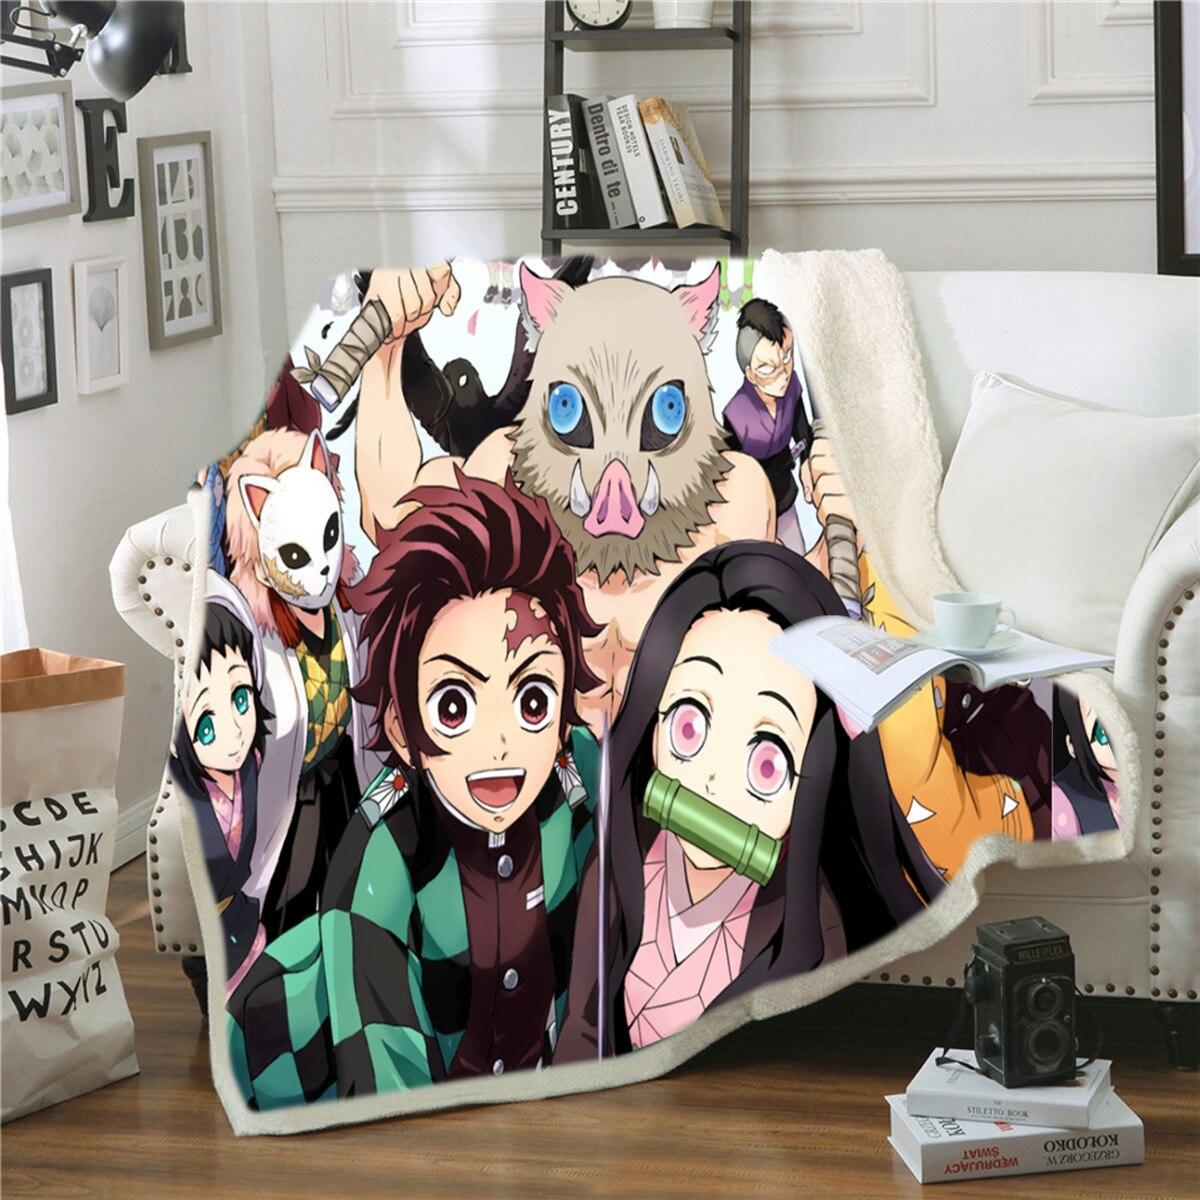 Devil's Blade Anime Home Textile Demon Slayer Kimetsu No Yaiba Kamado Tanjirou Nezuko Double Plush Lamb Down Blanket Bedding